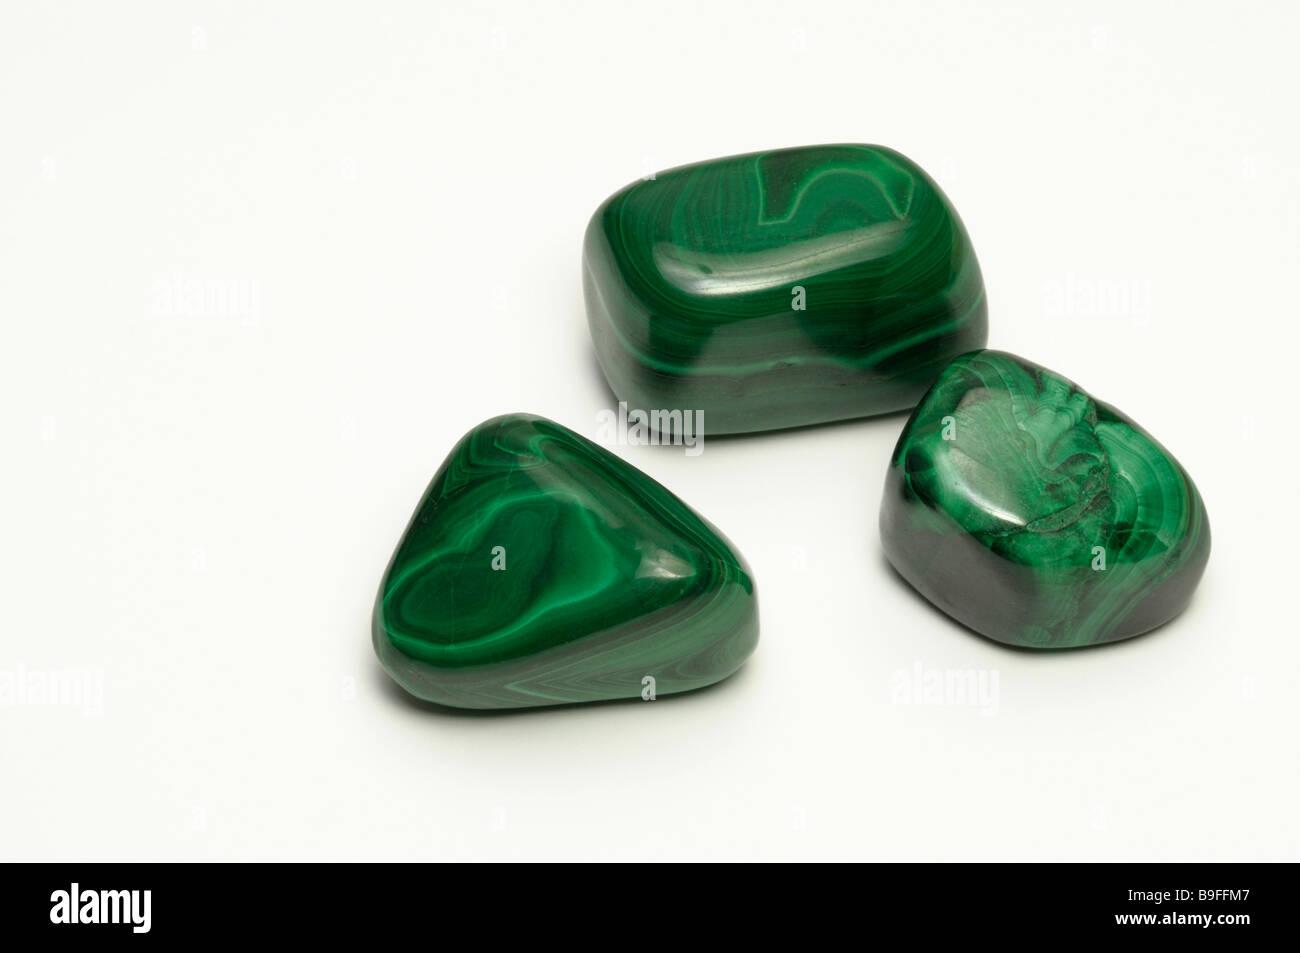 Malaquita, tres piedras pulidas, studio picture Foto de stock